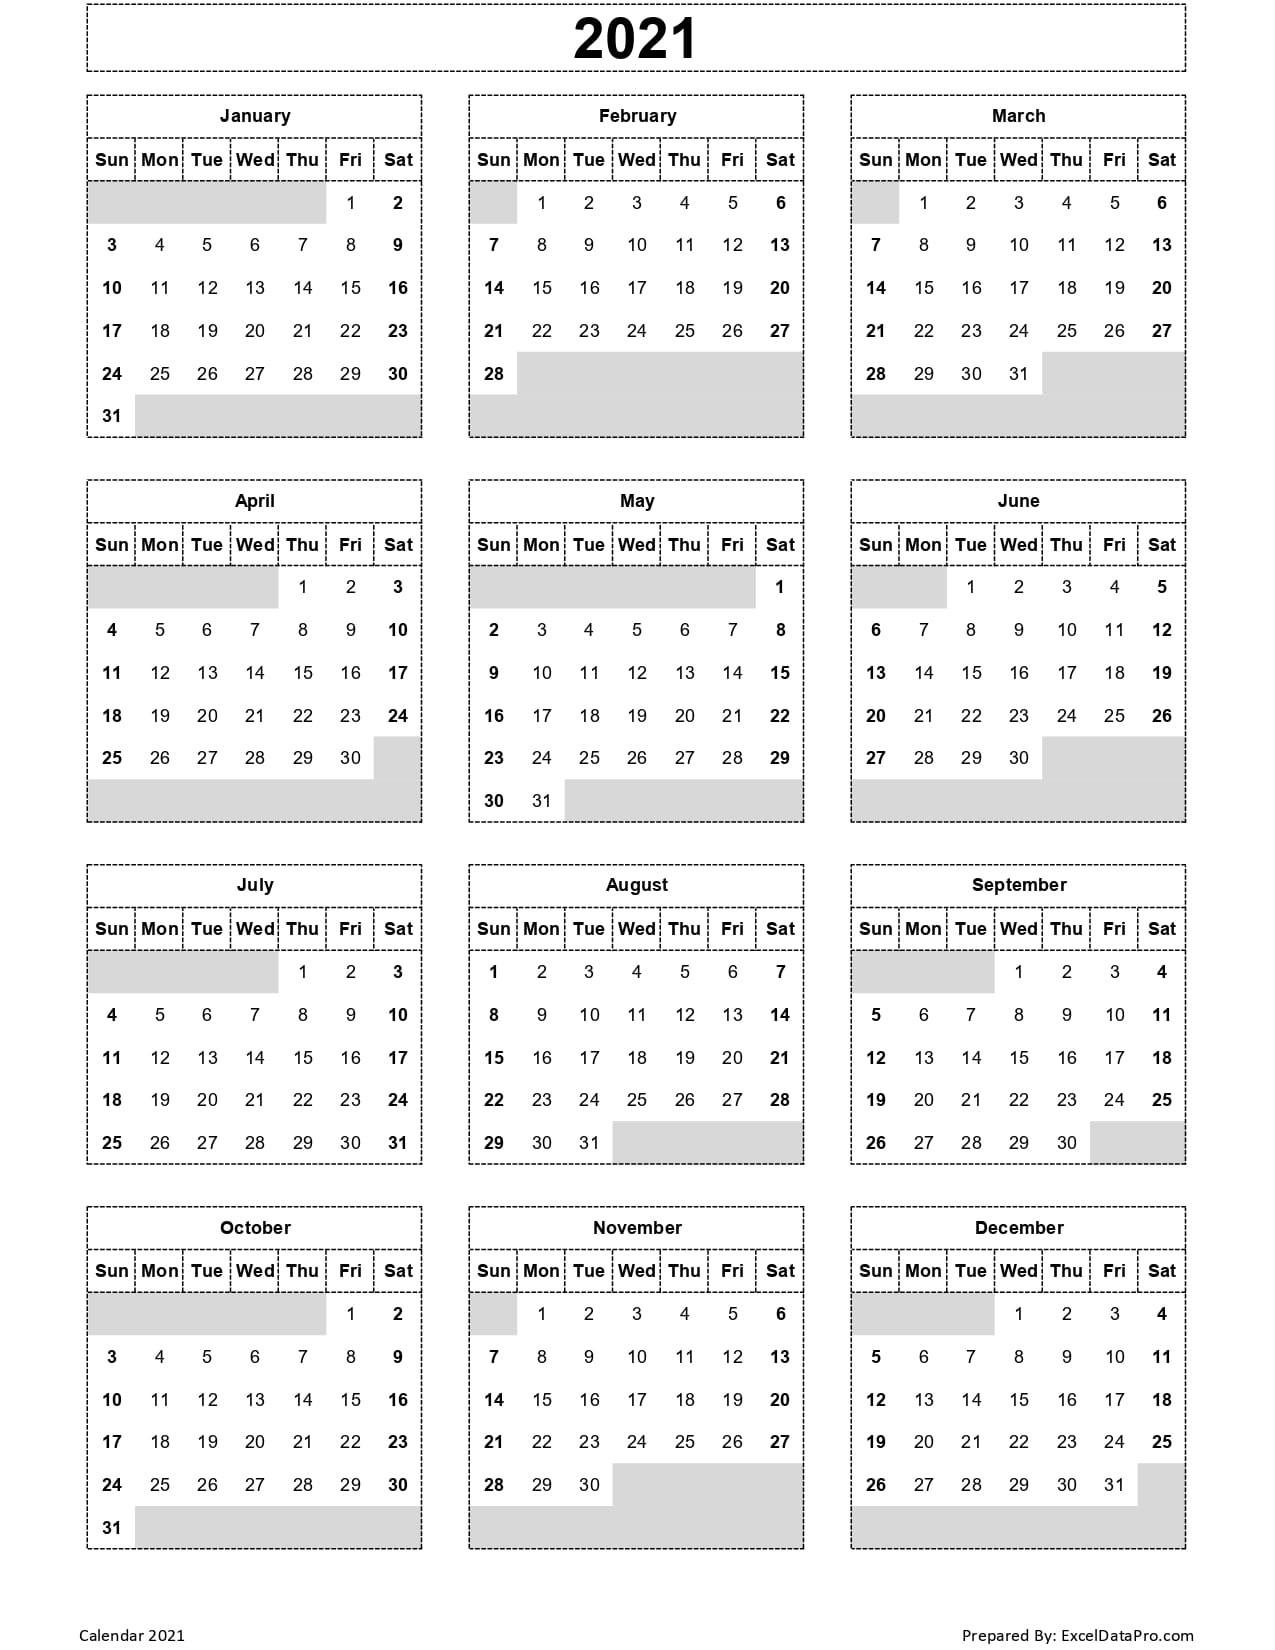 Calendar 2021 Excel Templates Printable PDFs &